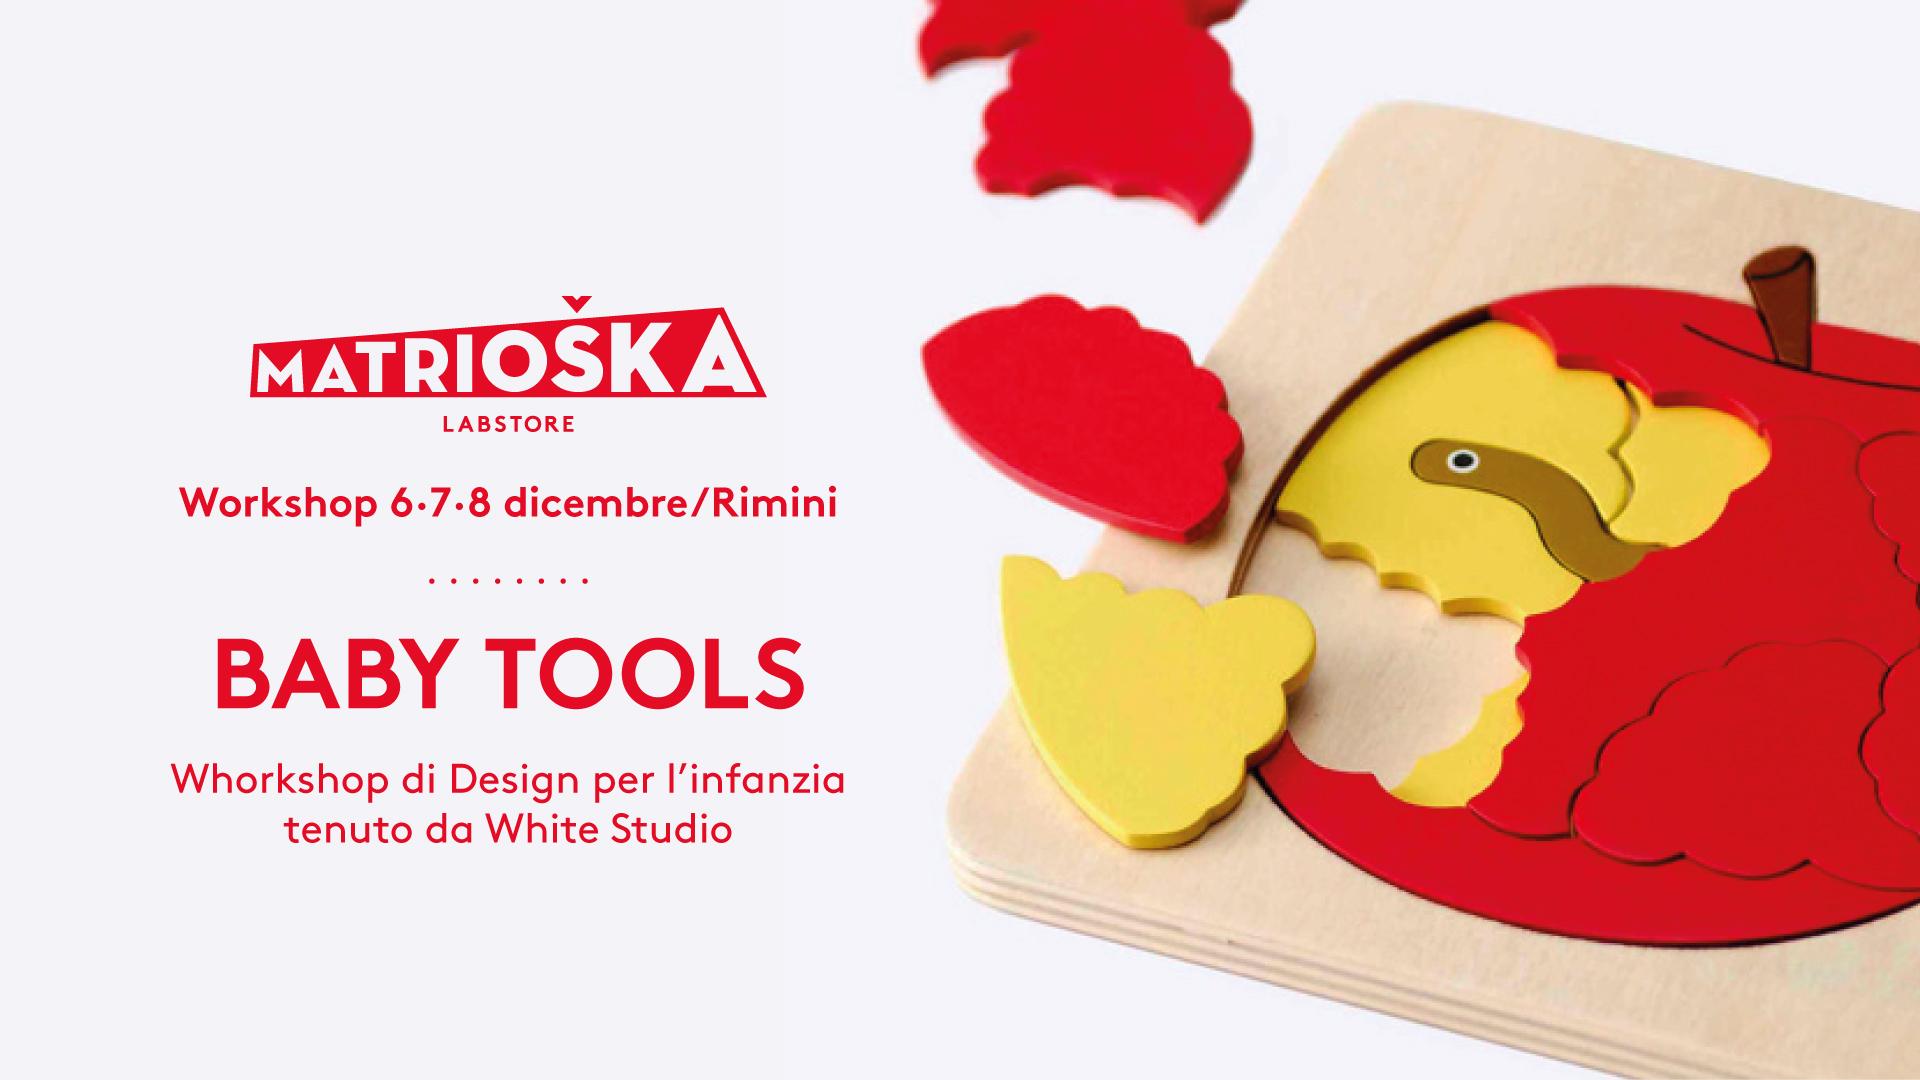 Matrioska_6_ws01_Baby-tools-workshop